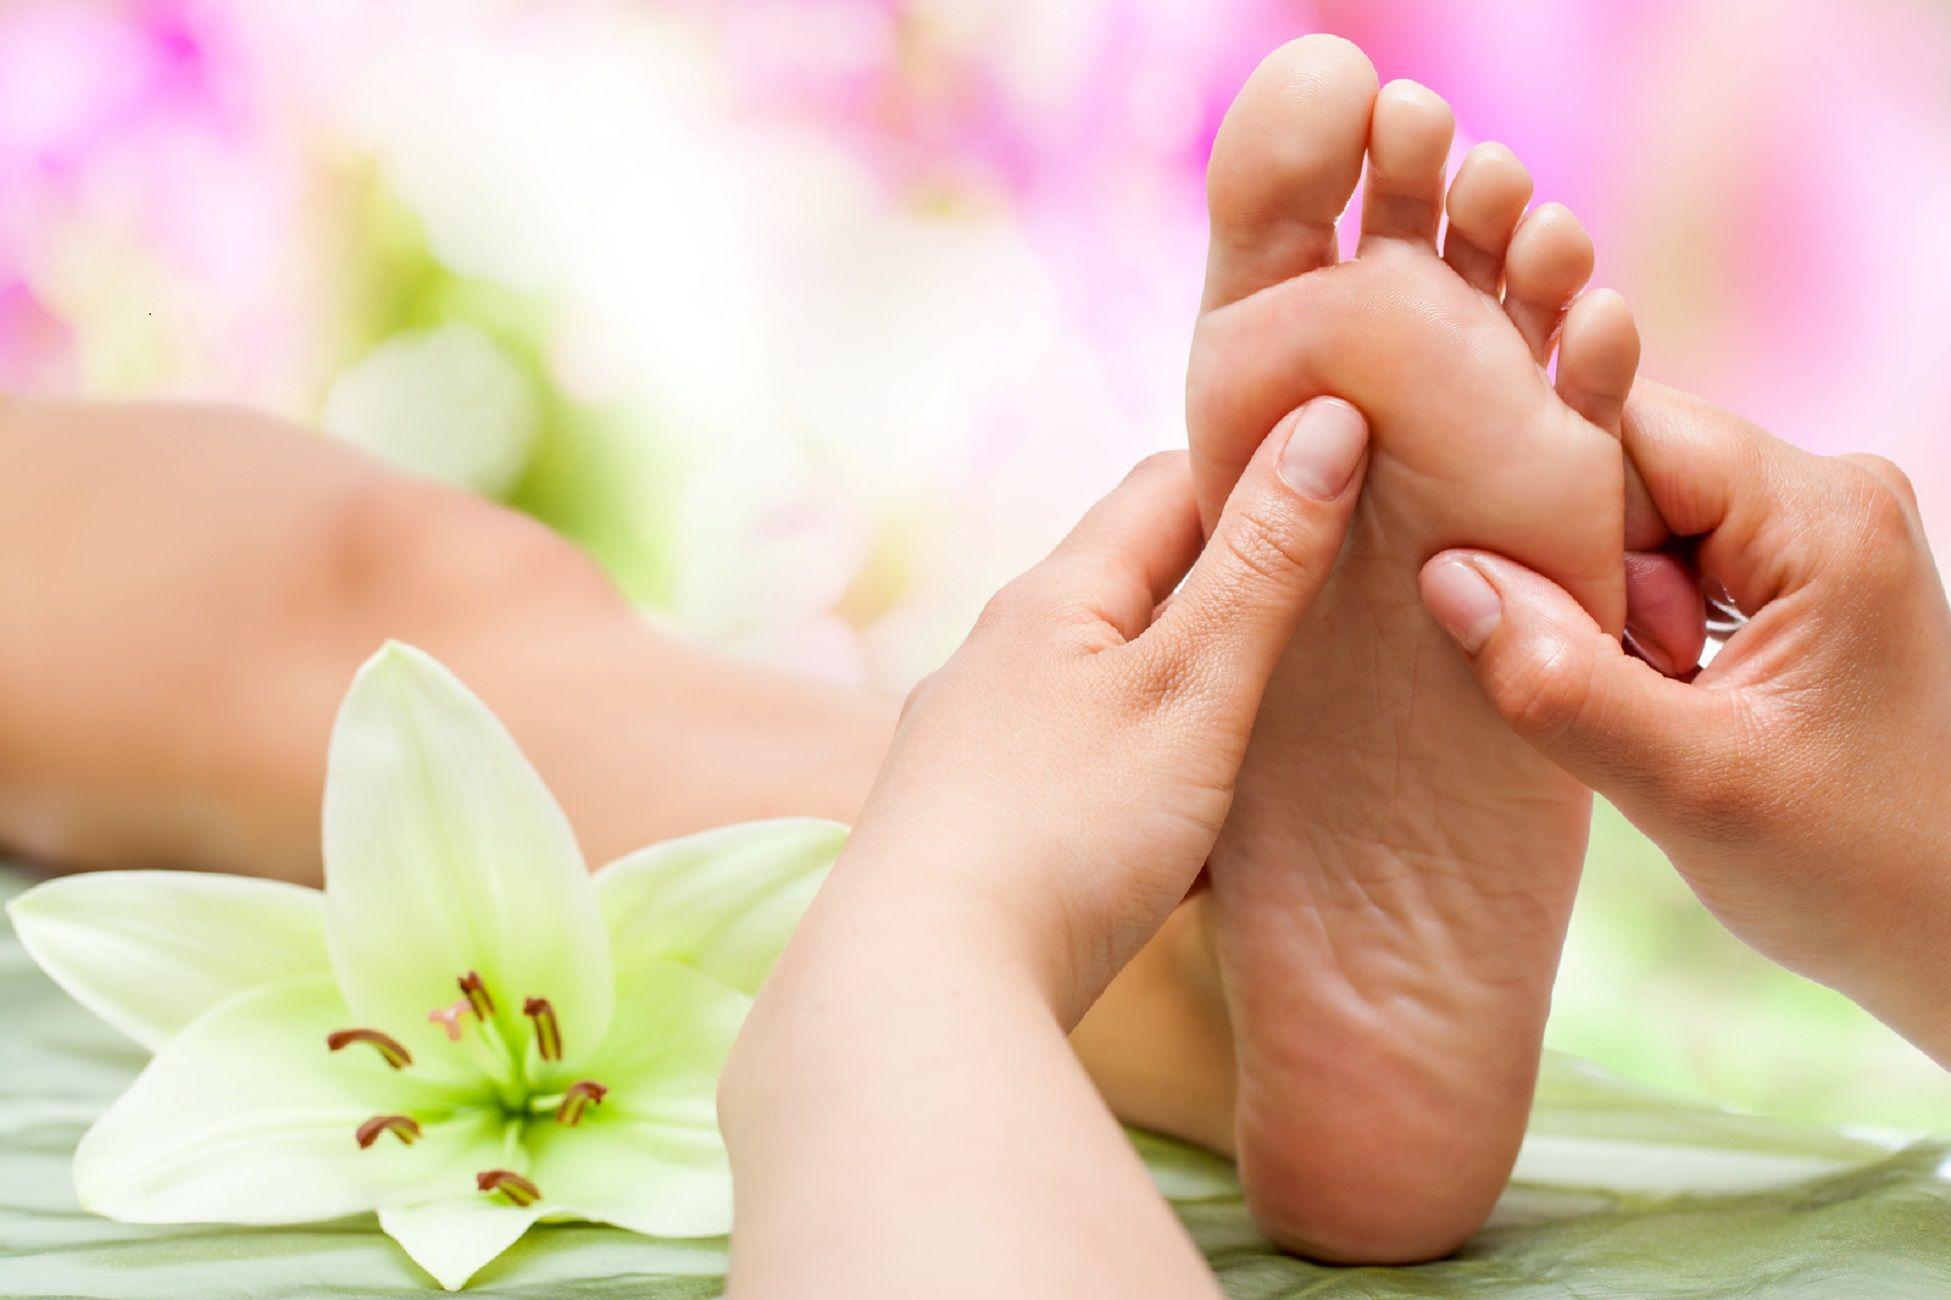 Mobile Massage London Foot massage, Foot reflexology